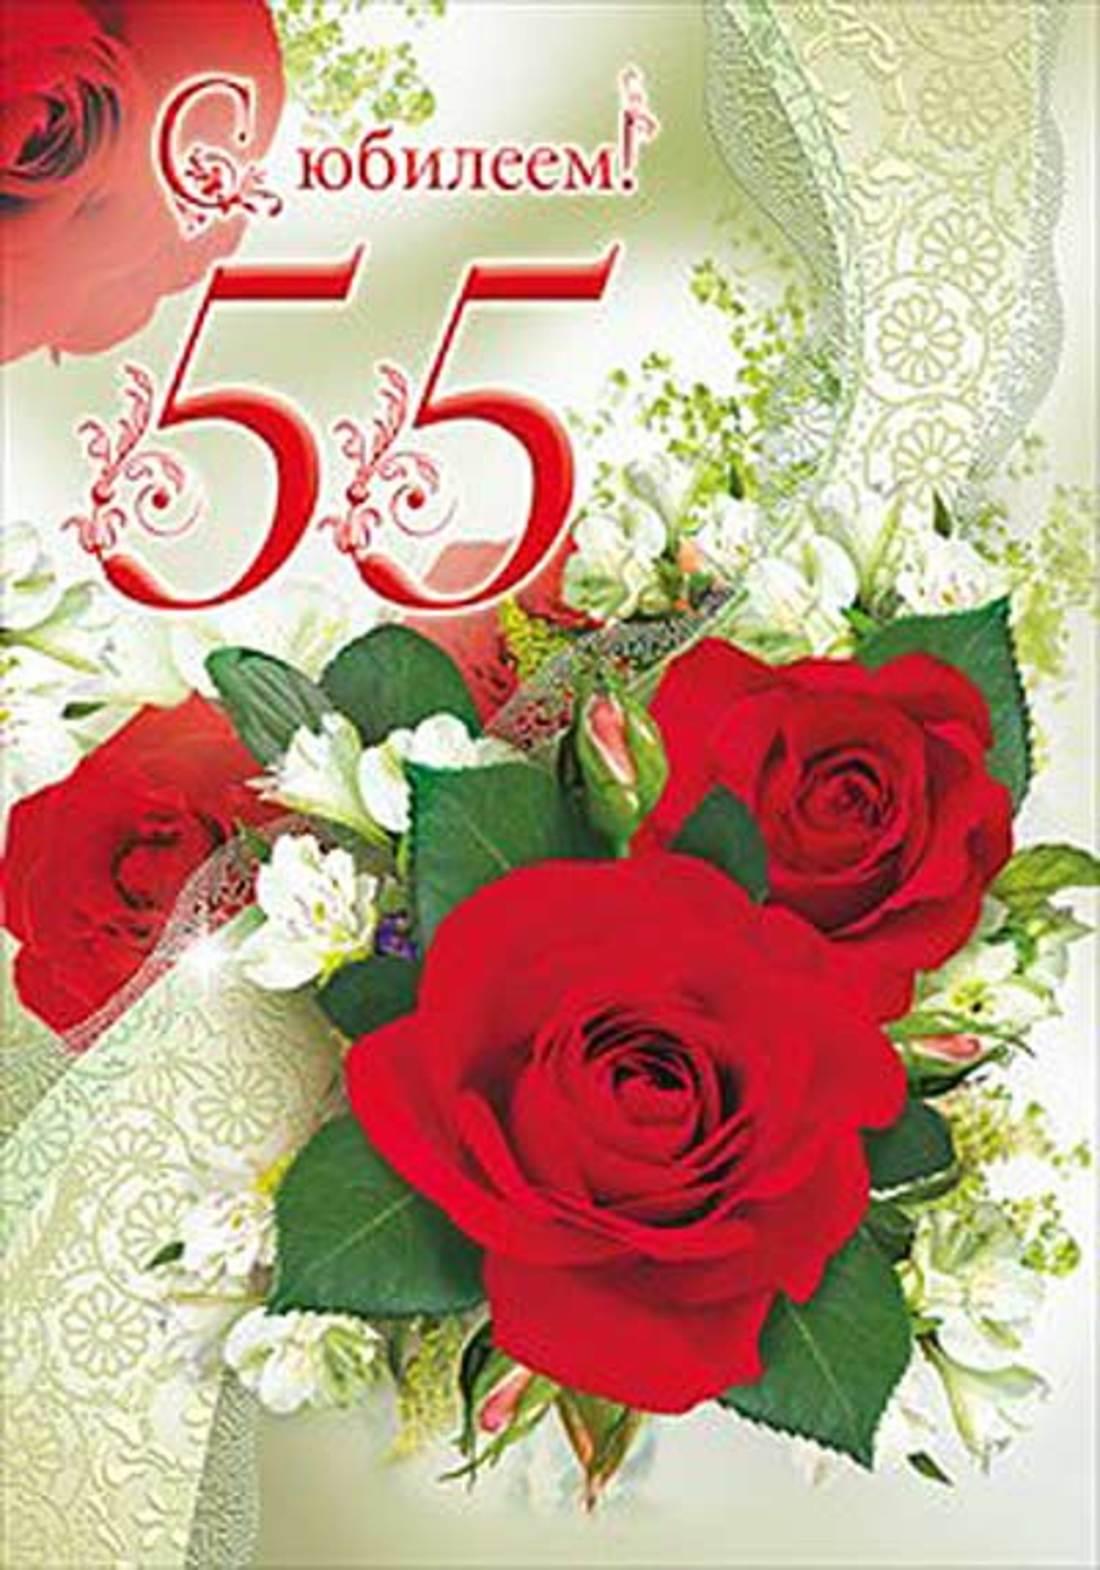 Стихи открытки с юбилеем 55 лет, картинки названиями